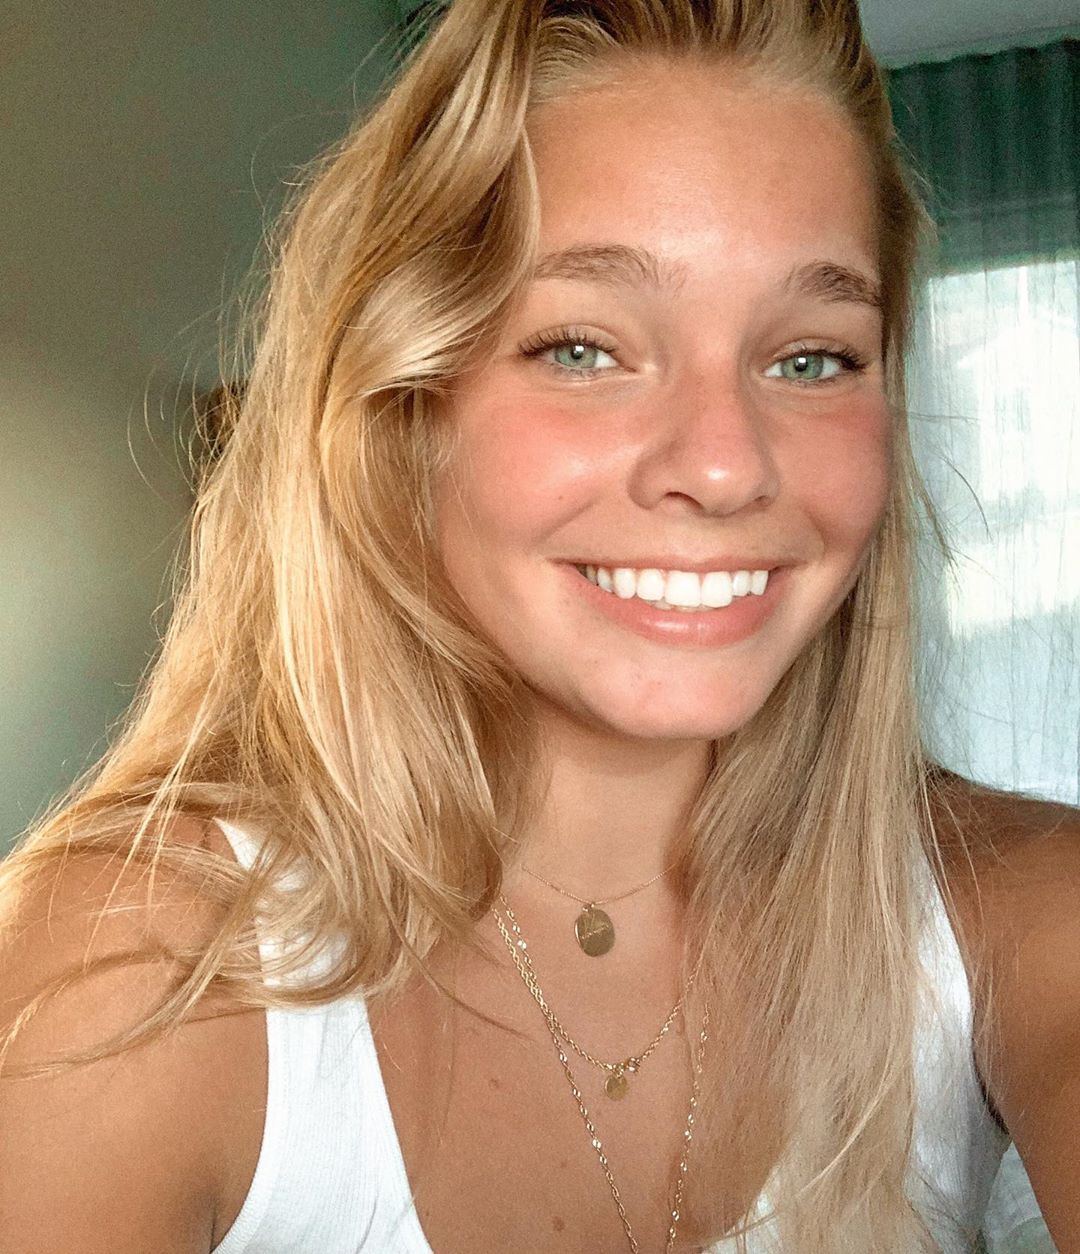 The most beautiful Swedish girls - 2 | Pretty girls